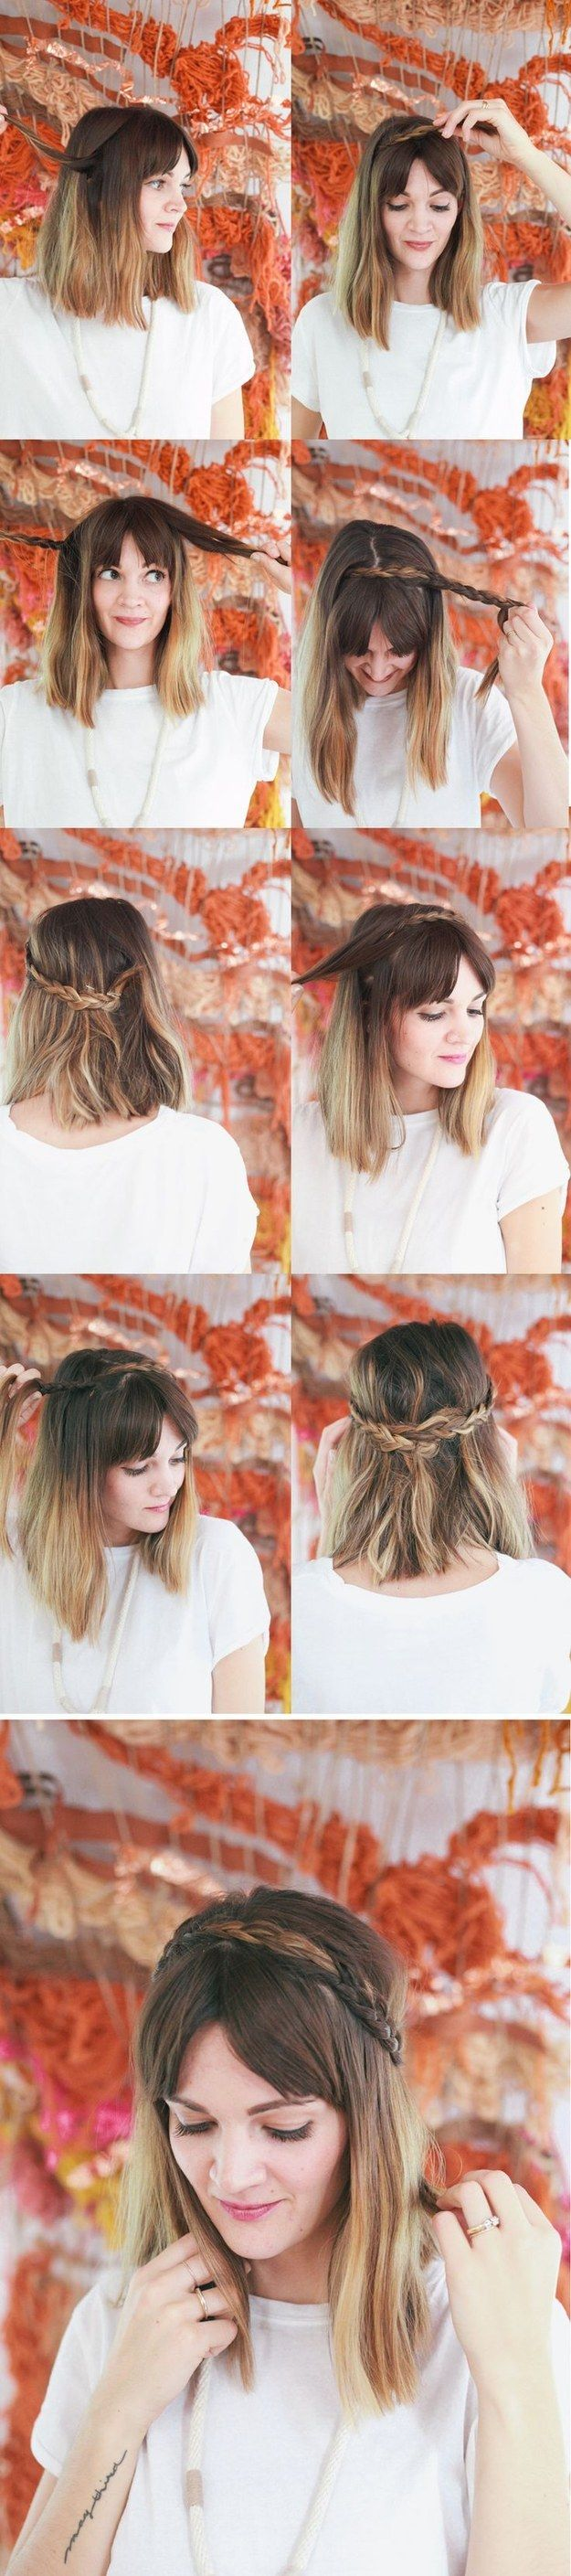 6 Hermosos Peinados Que Amaran Las Chicas Con Corte Bob Hair Style